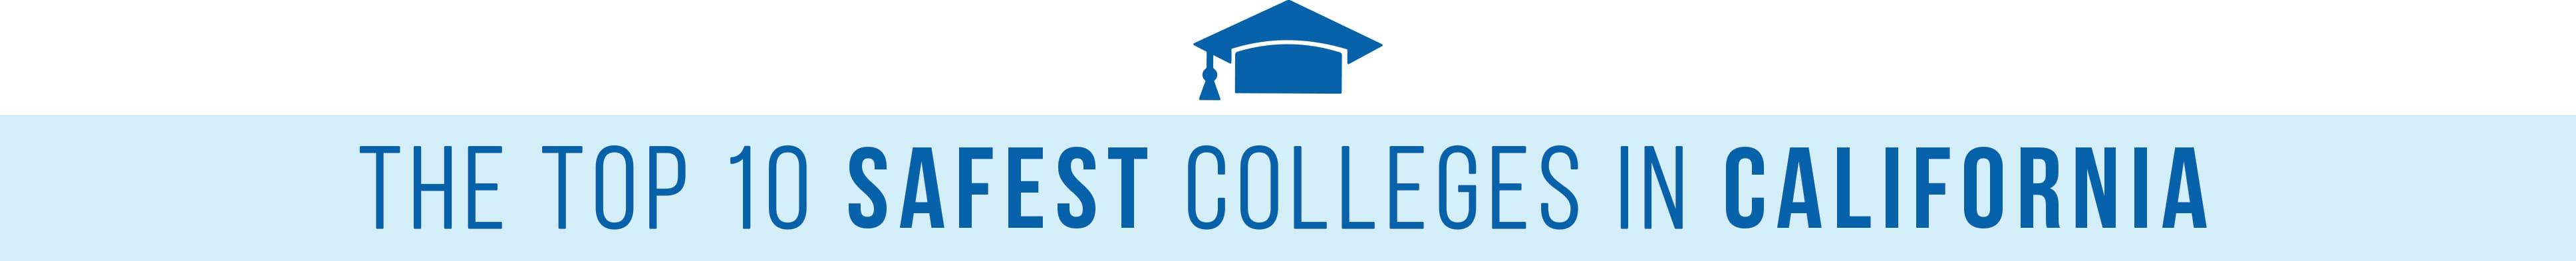 safest college campuses CA header